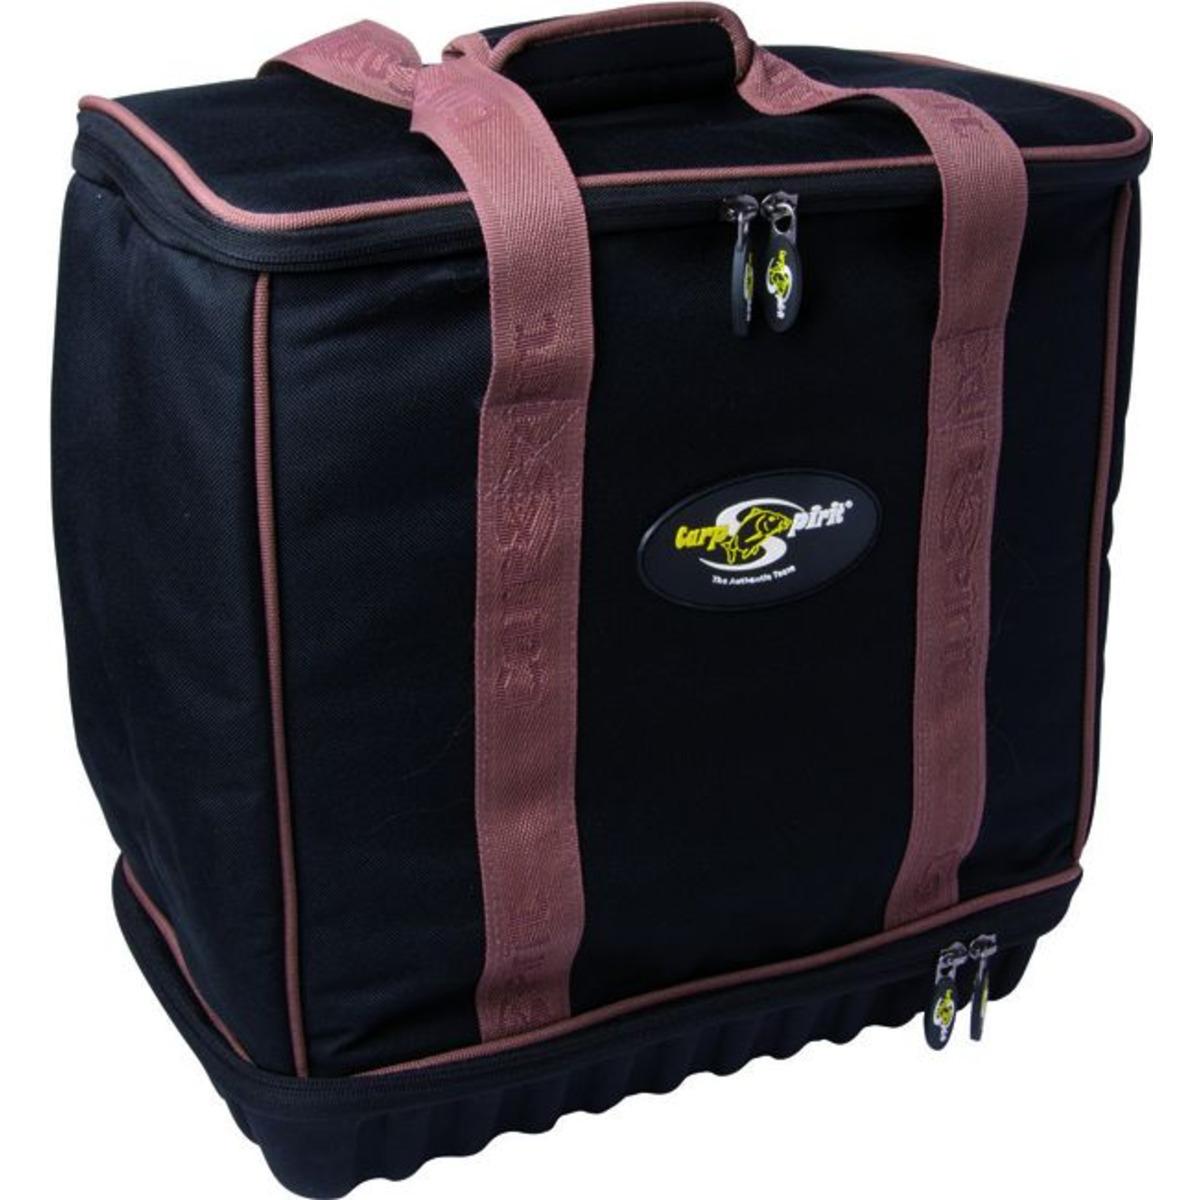 Carp Spirit Cooler Bag - 1.5 kg - 39x40x22 cm